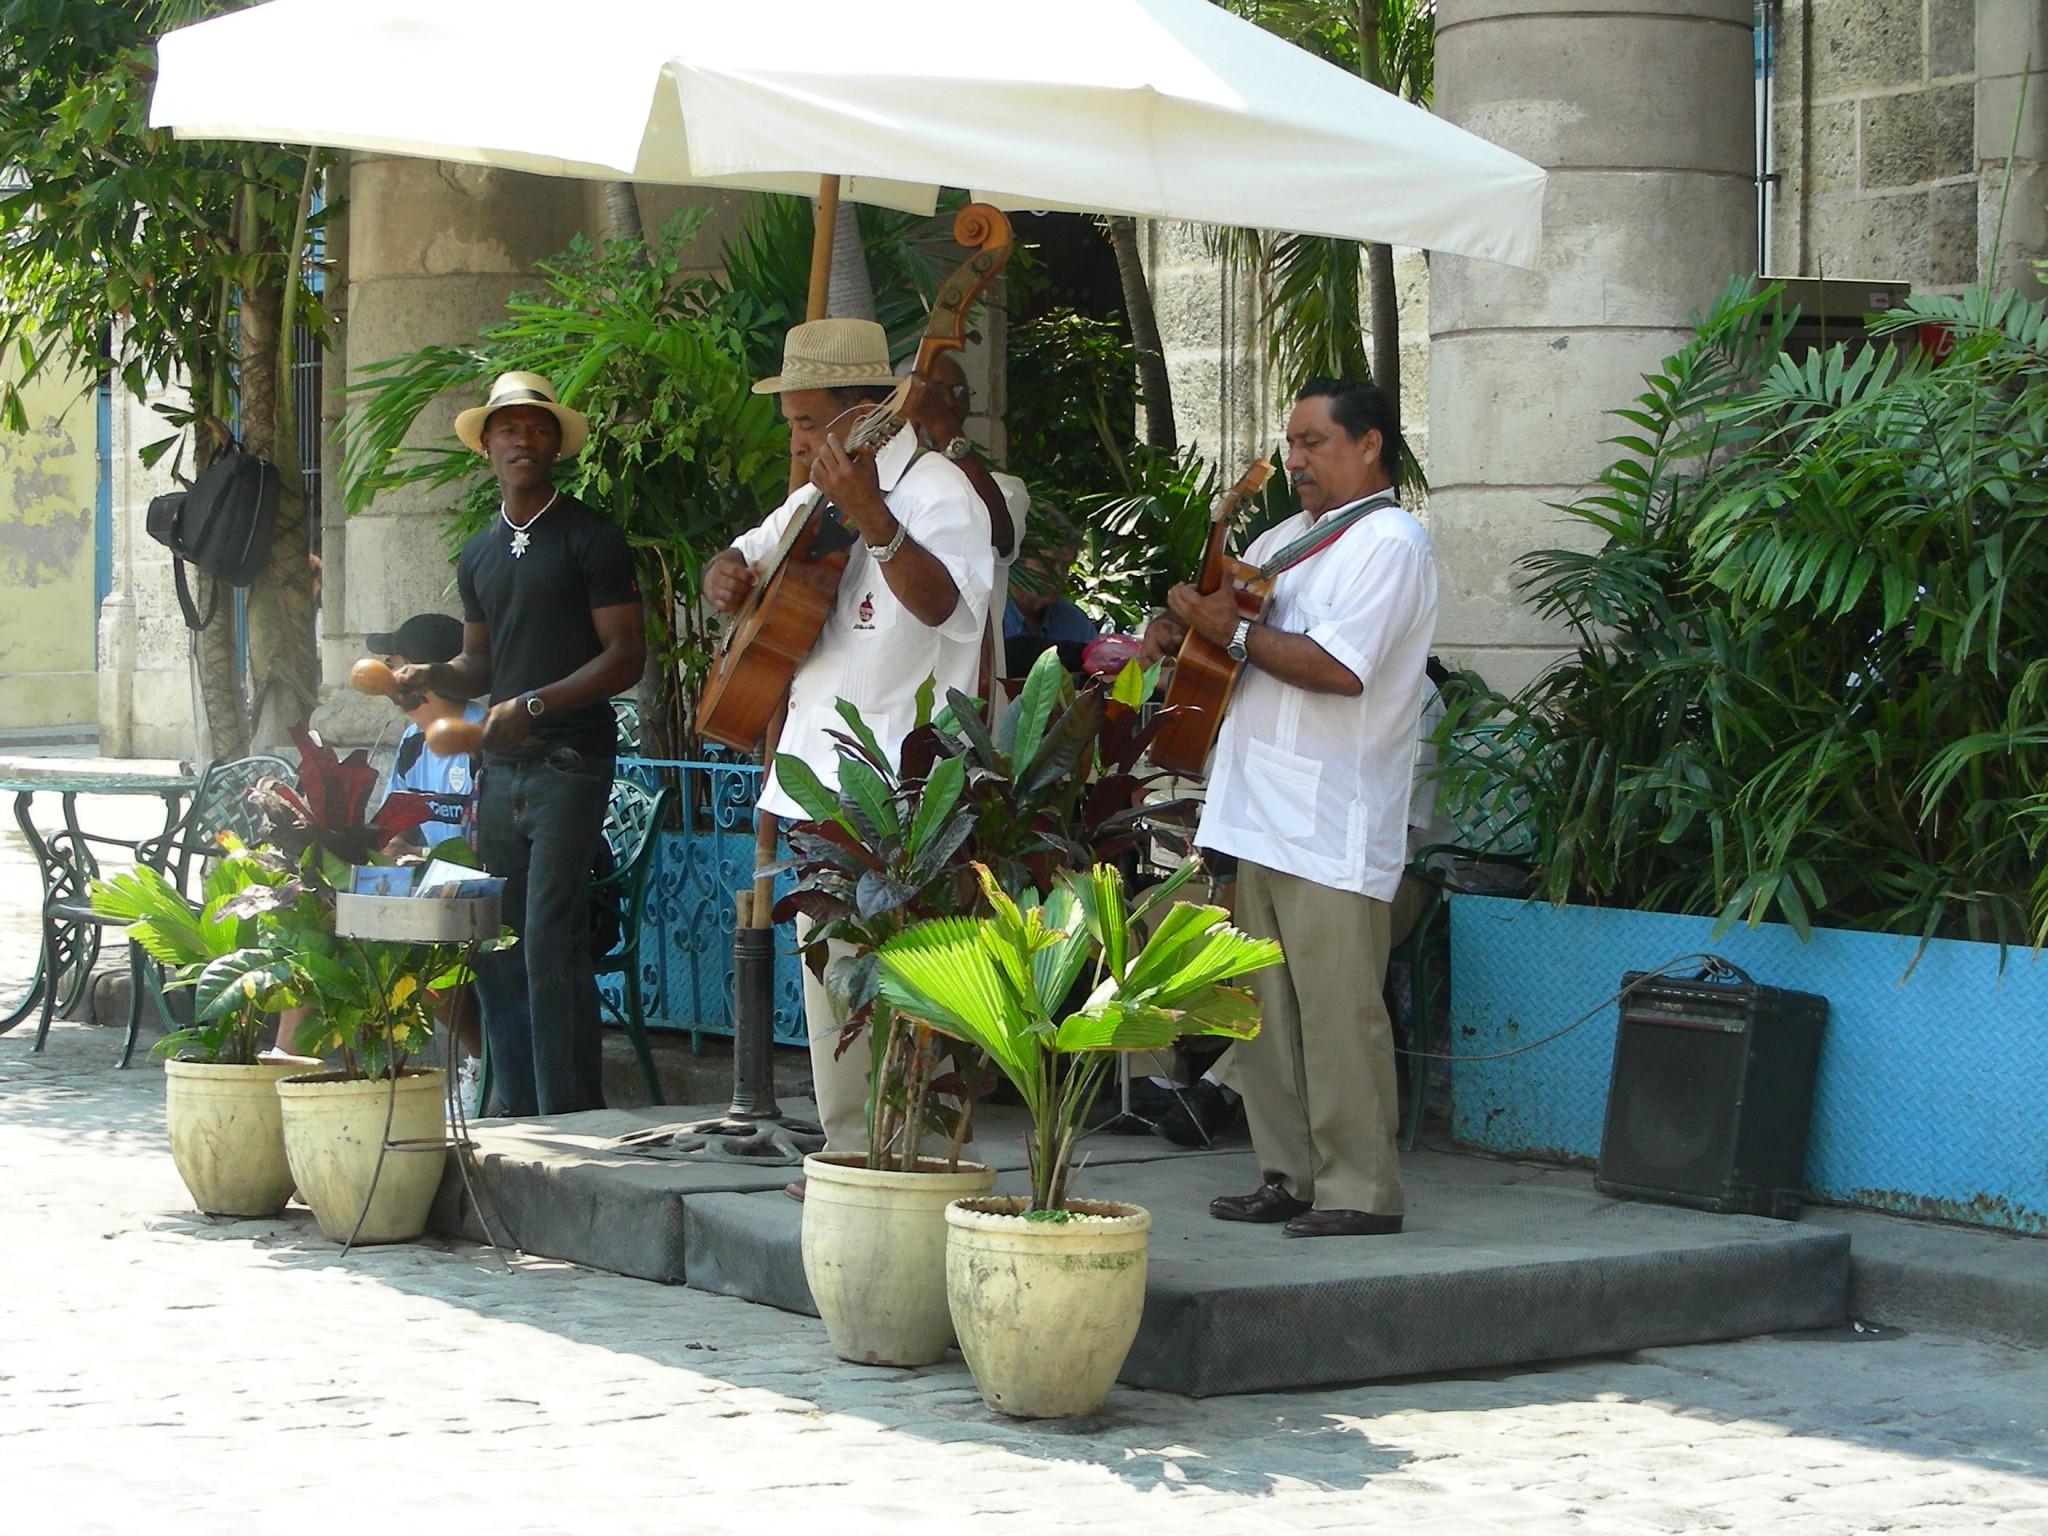 Havanna band